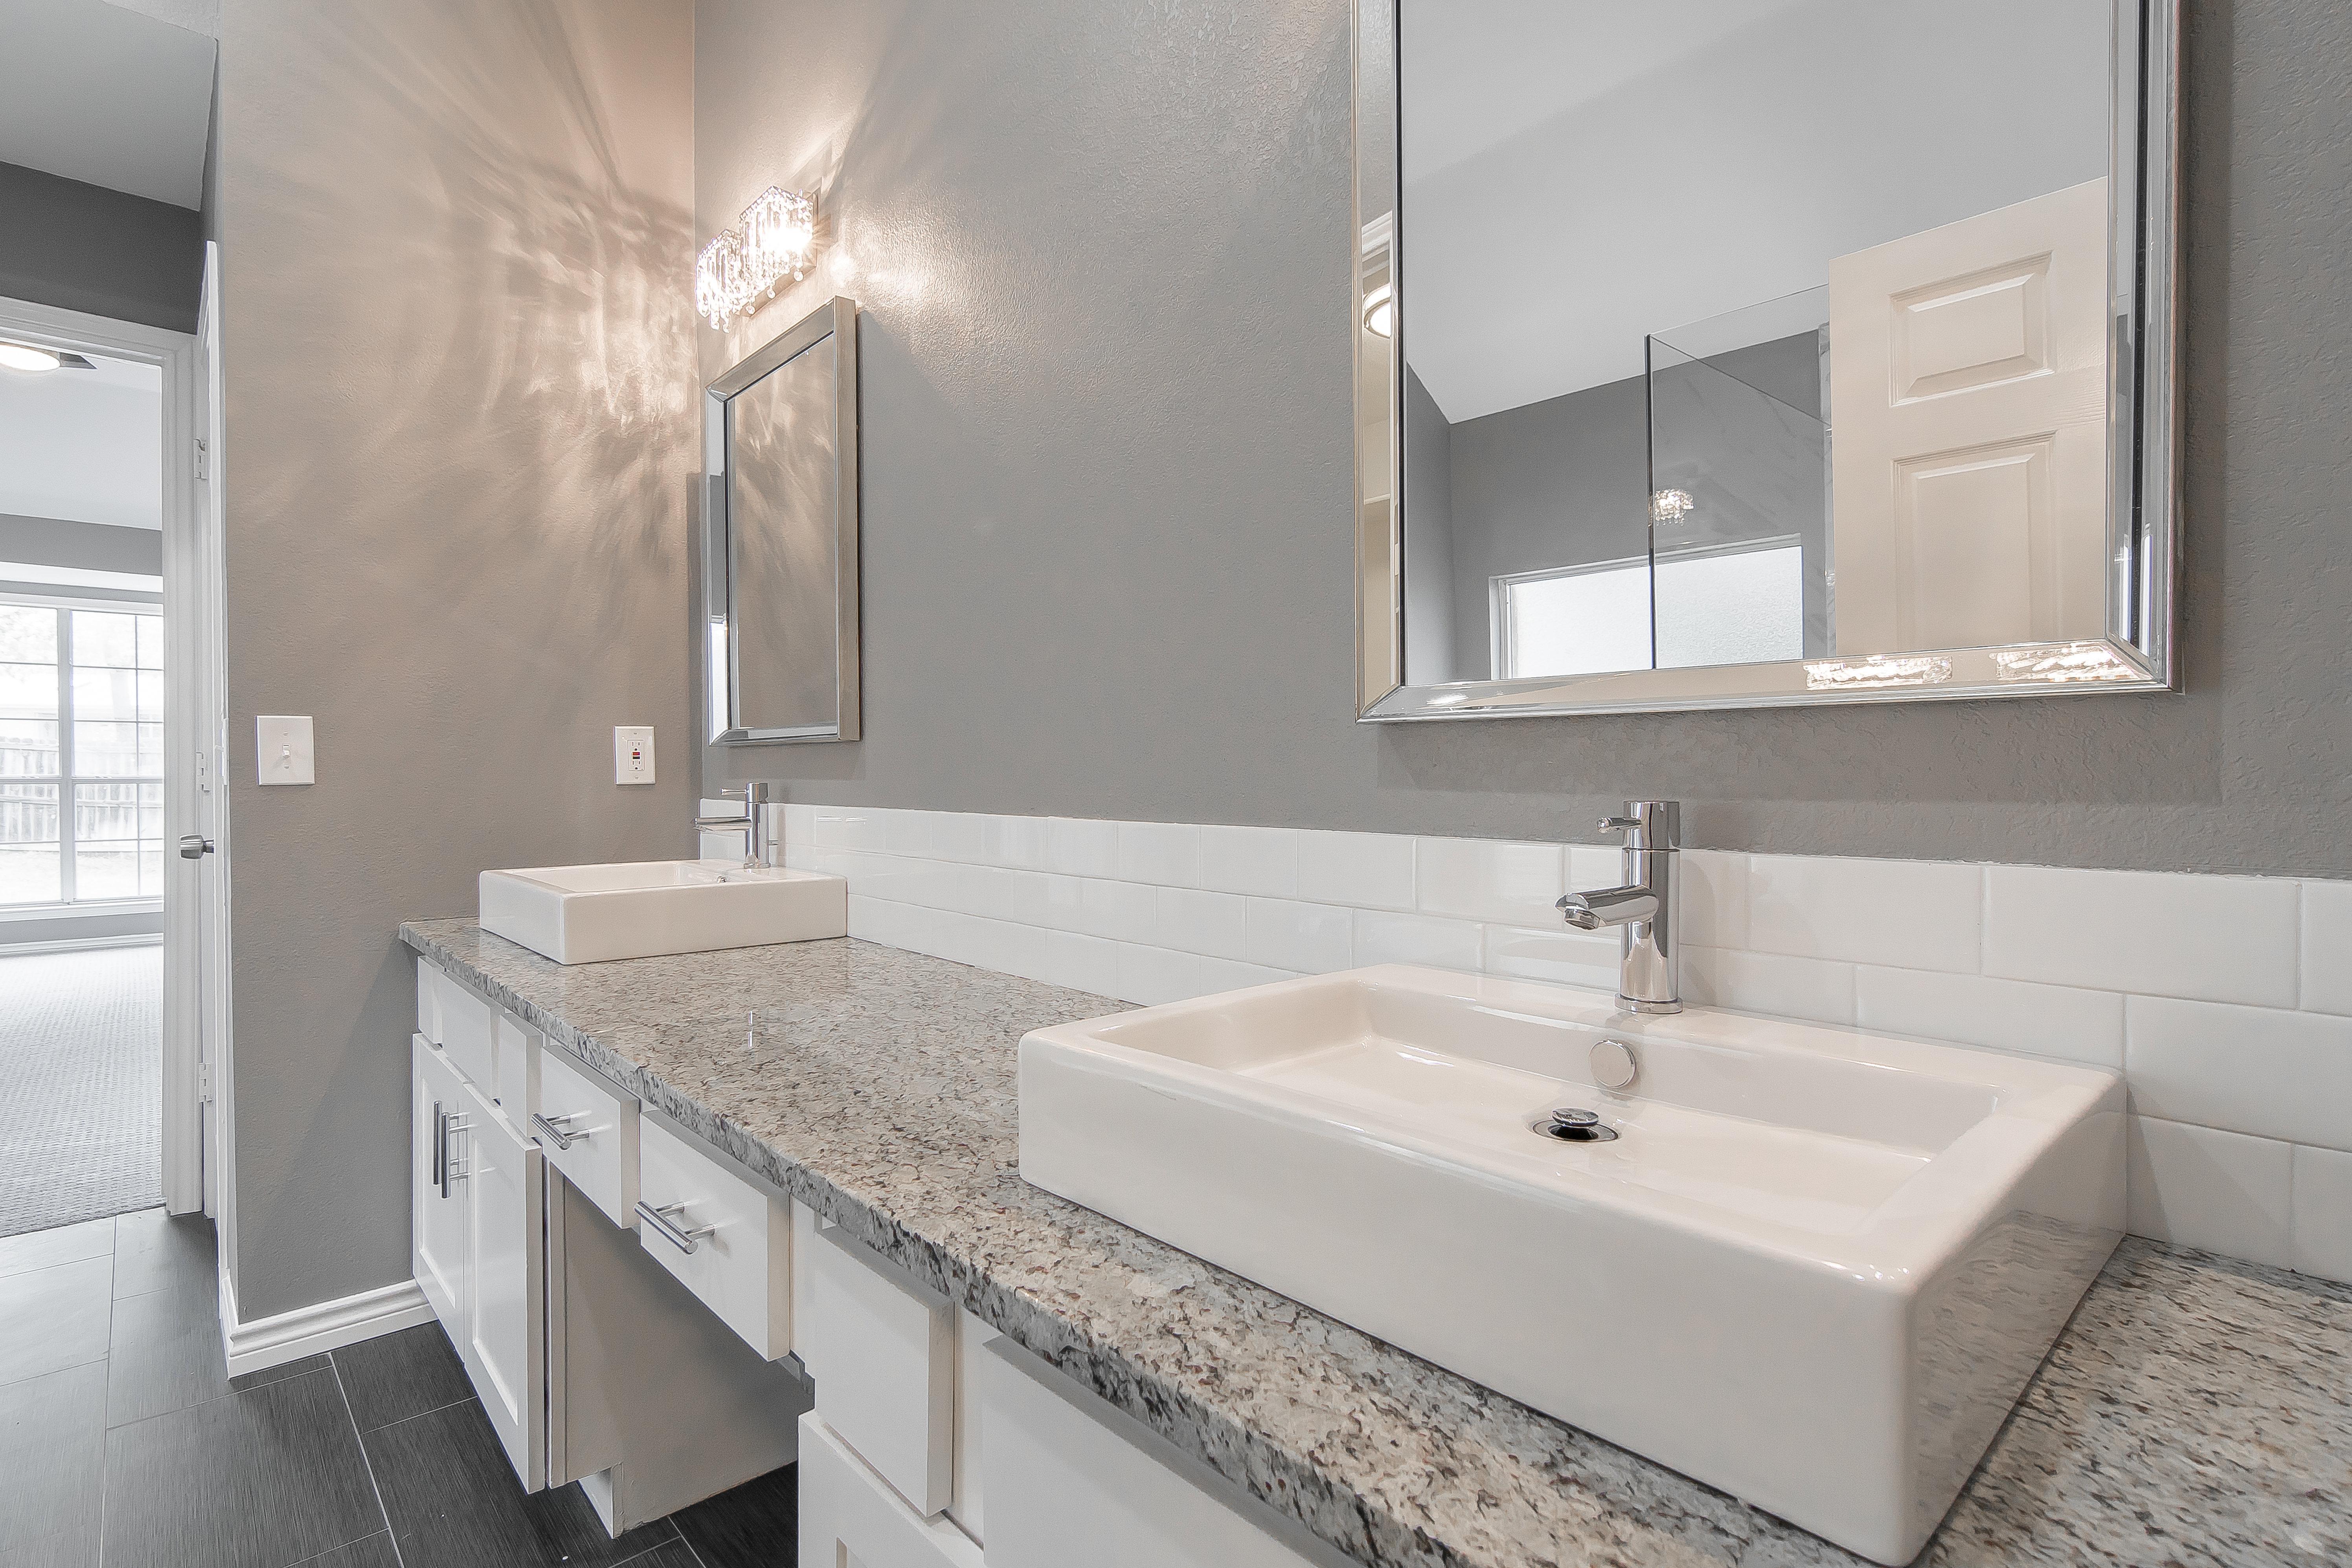 Master bathroom images